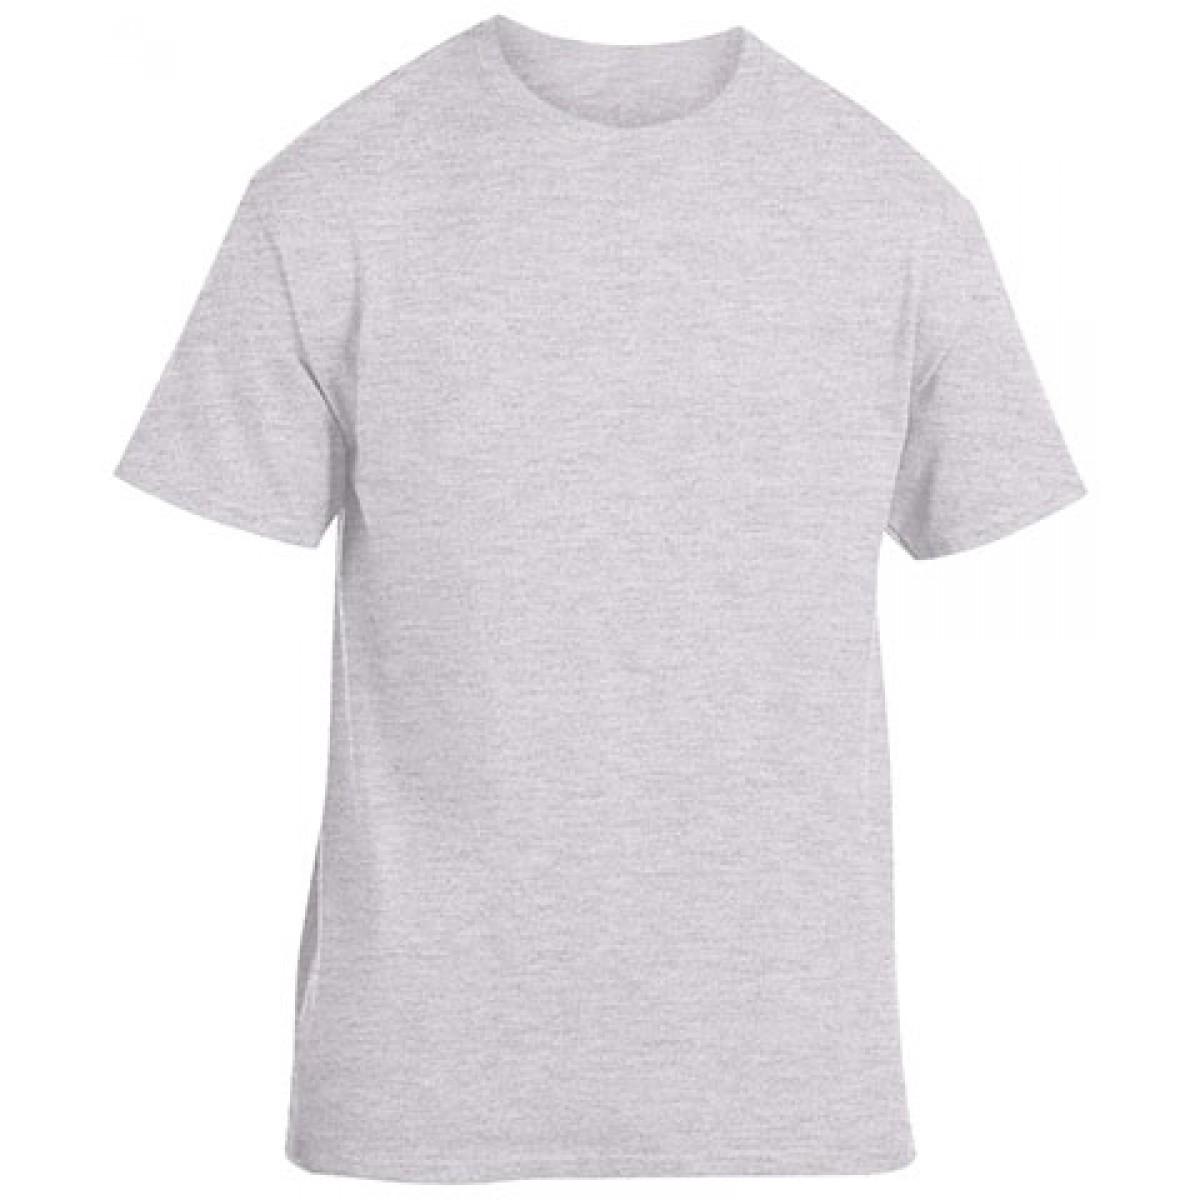 Heavy Cotton Activewear T-Shirt-Sports Grey-L